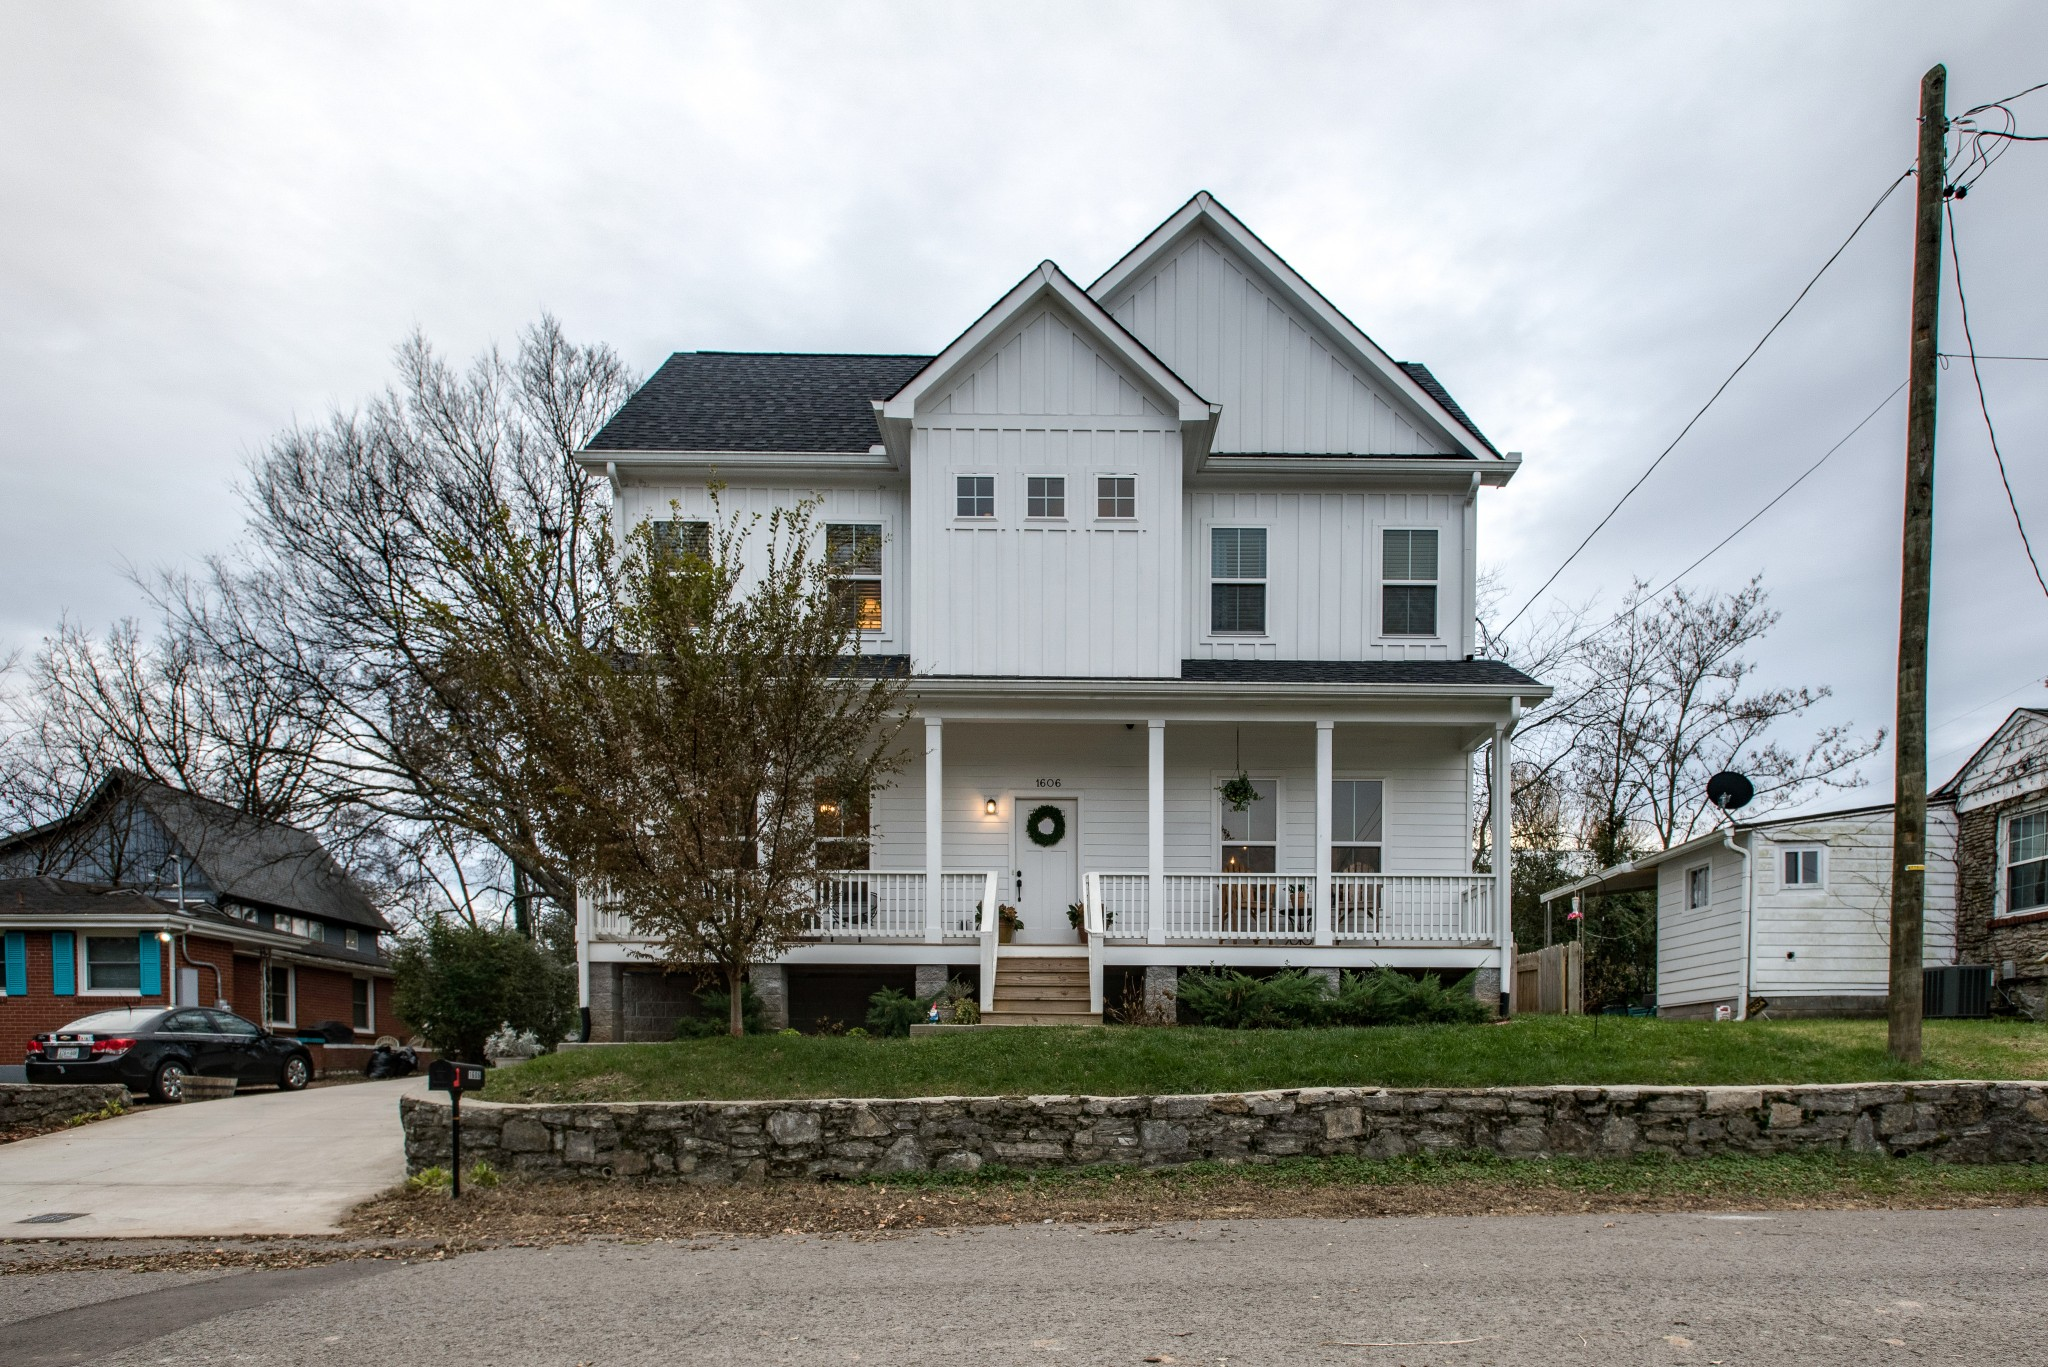 1606 Marsden Ave, Nashville, TN 37216 - Nashville, TN real estate listing